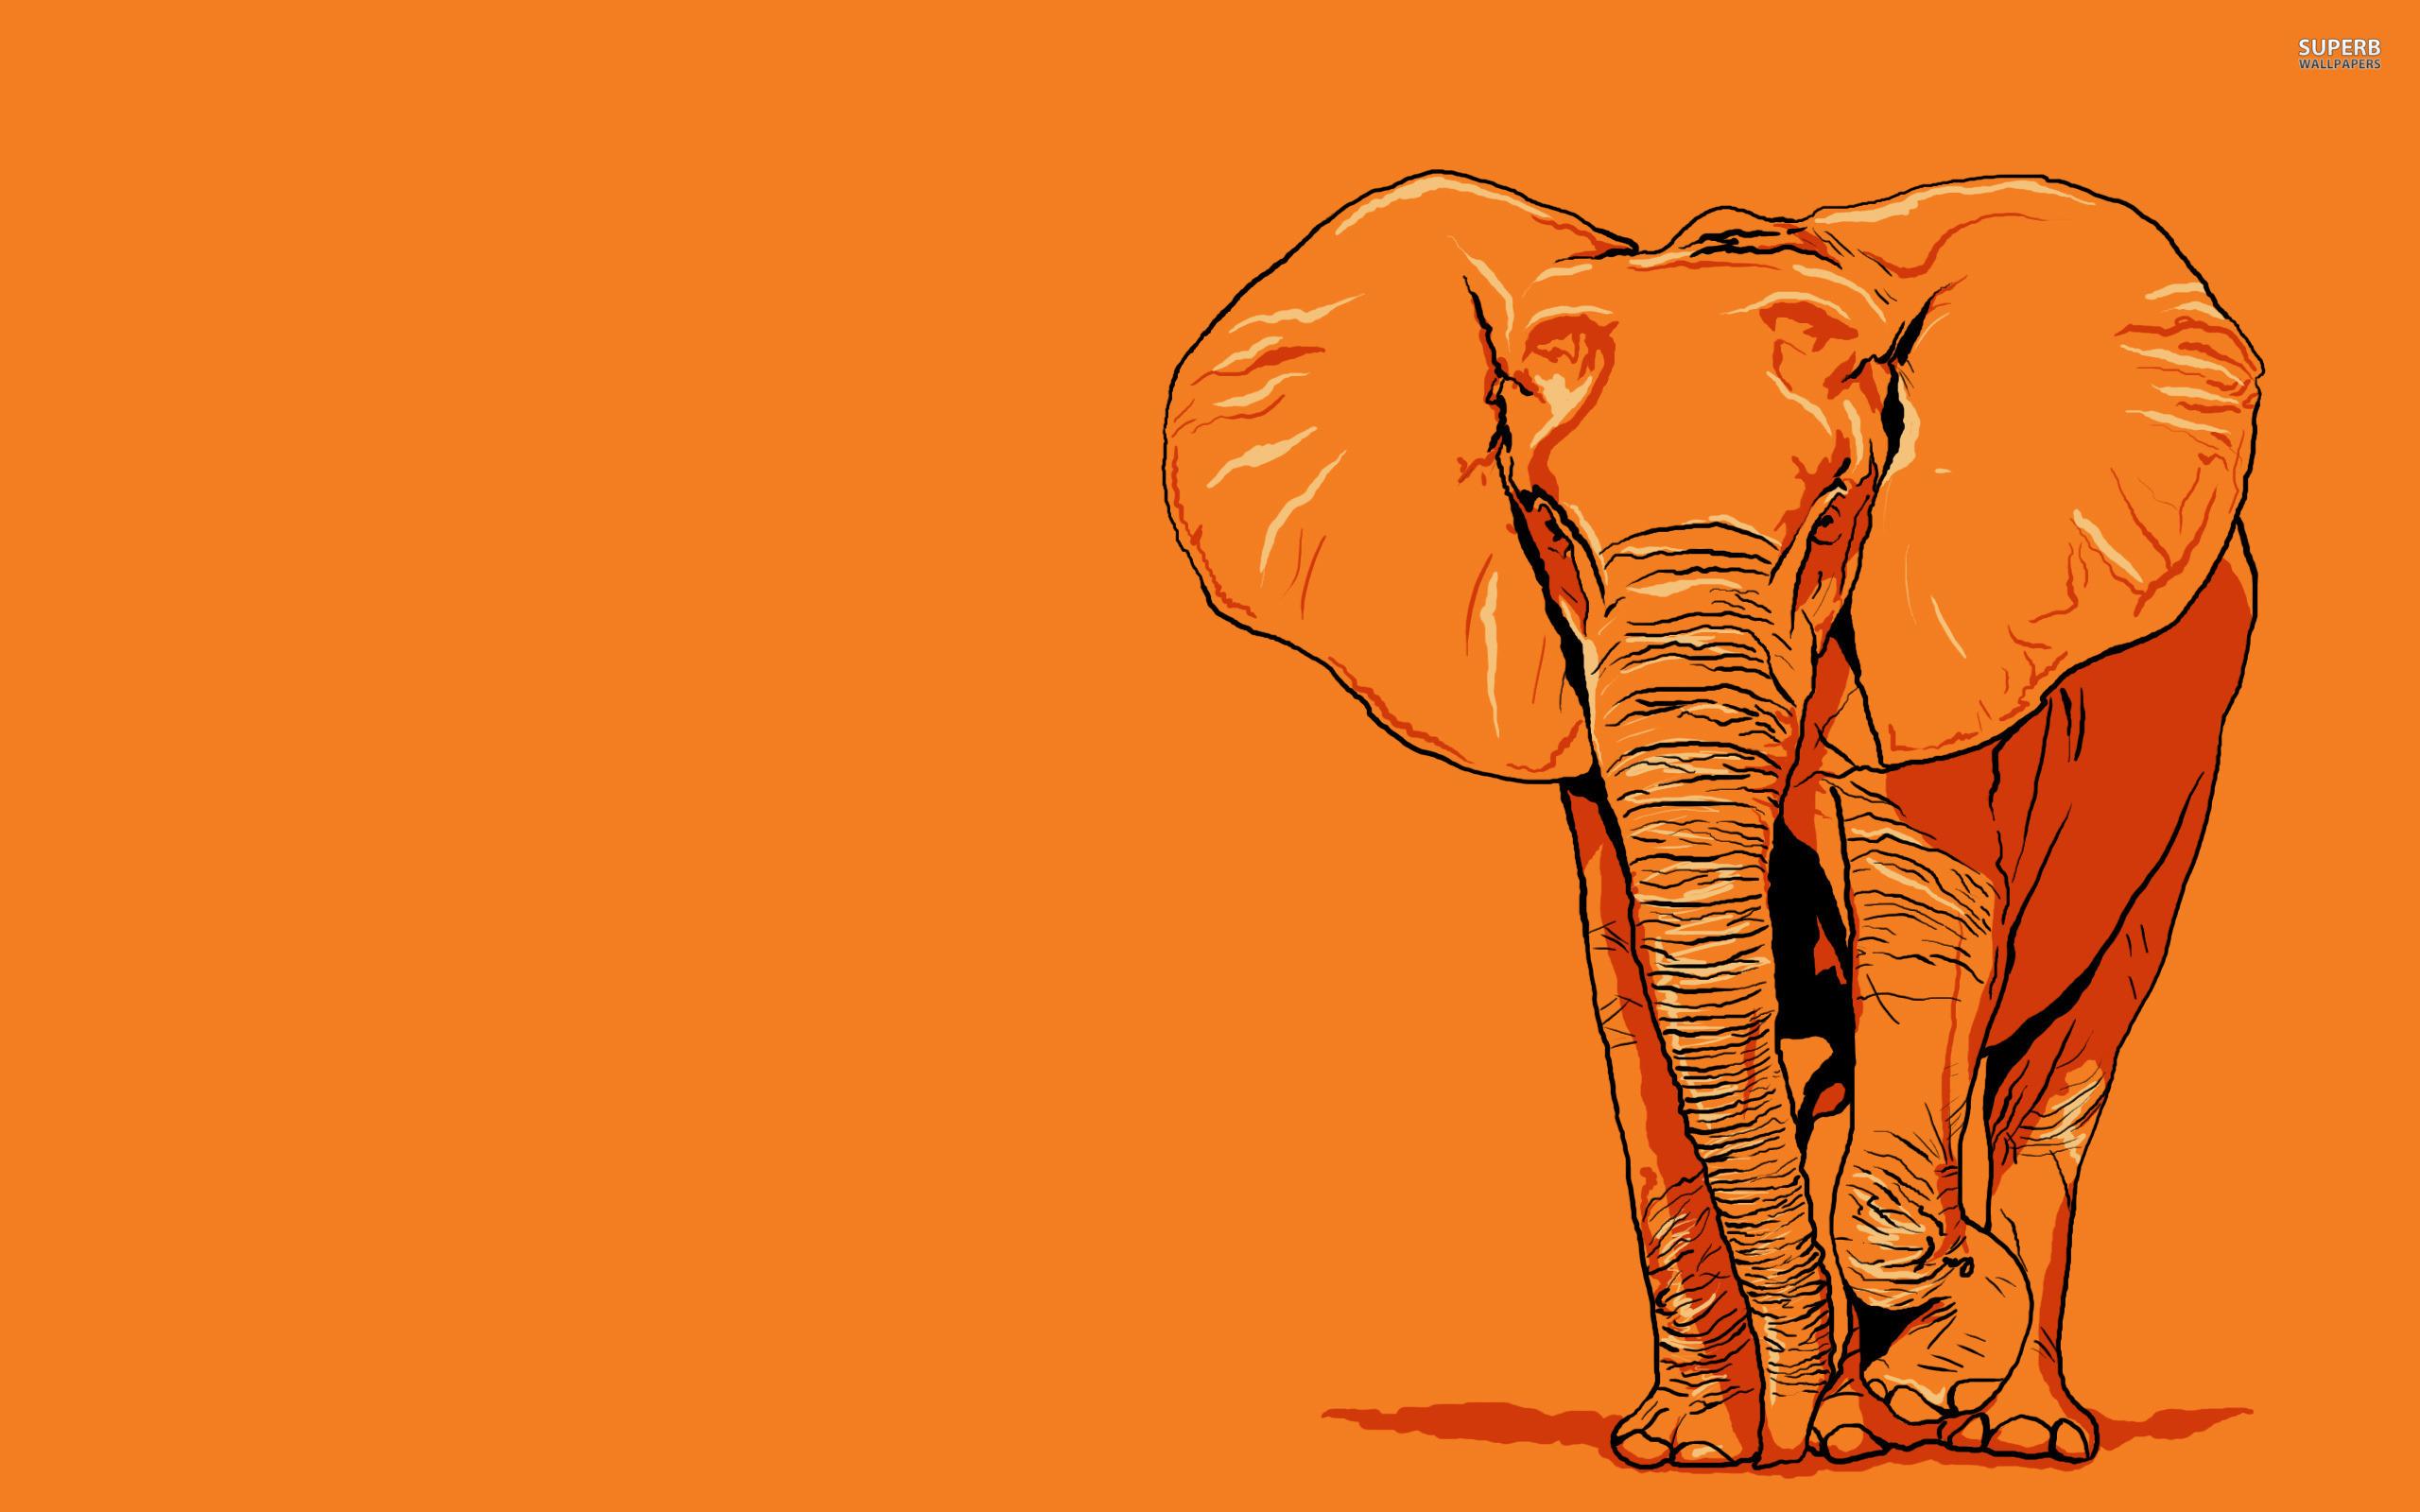 Elephant wallpaper 2560x1600 jpg